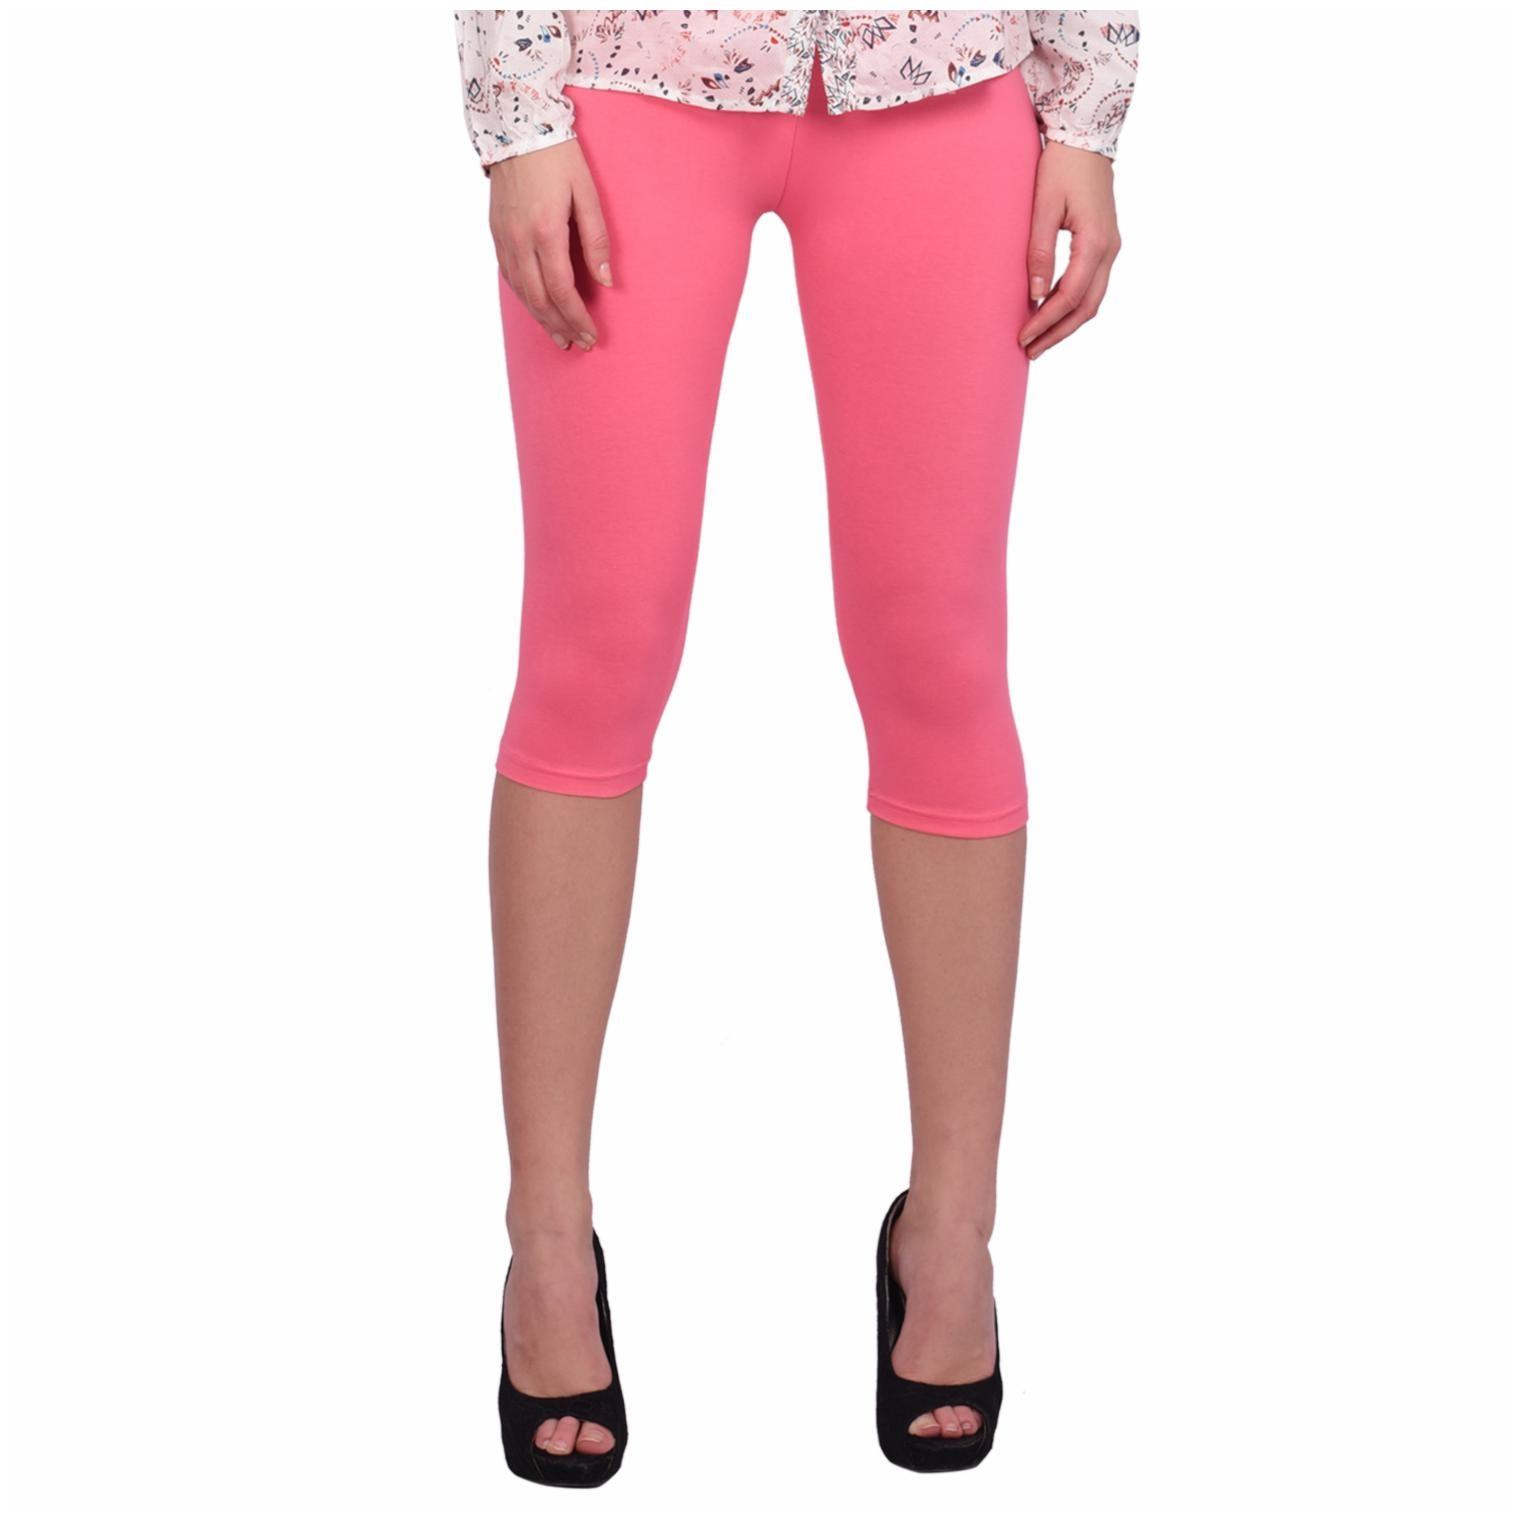 Robinbosky Cotton Leggings - Pink